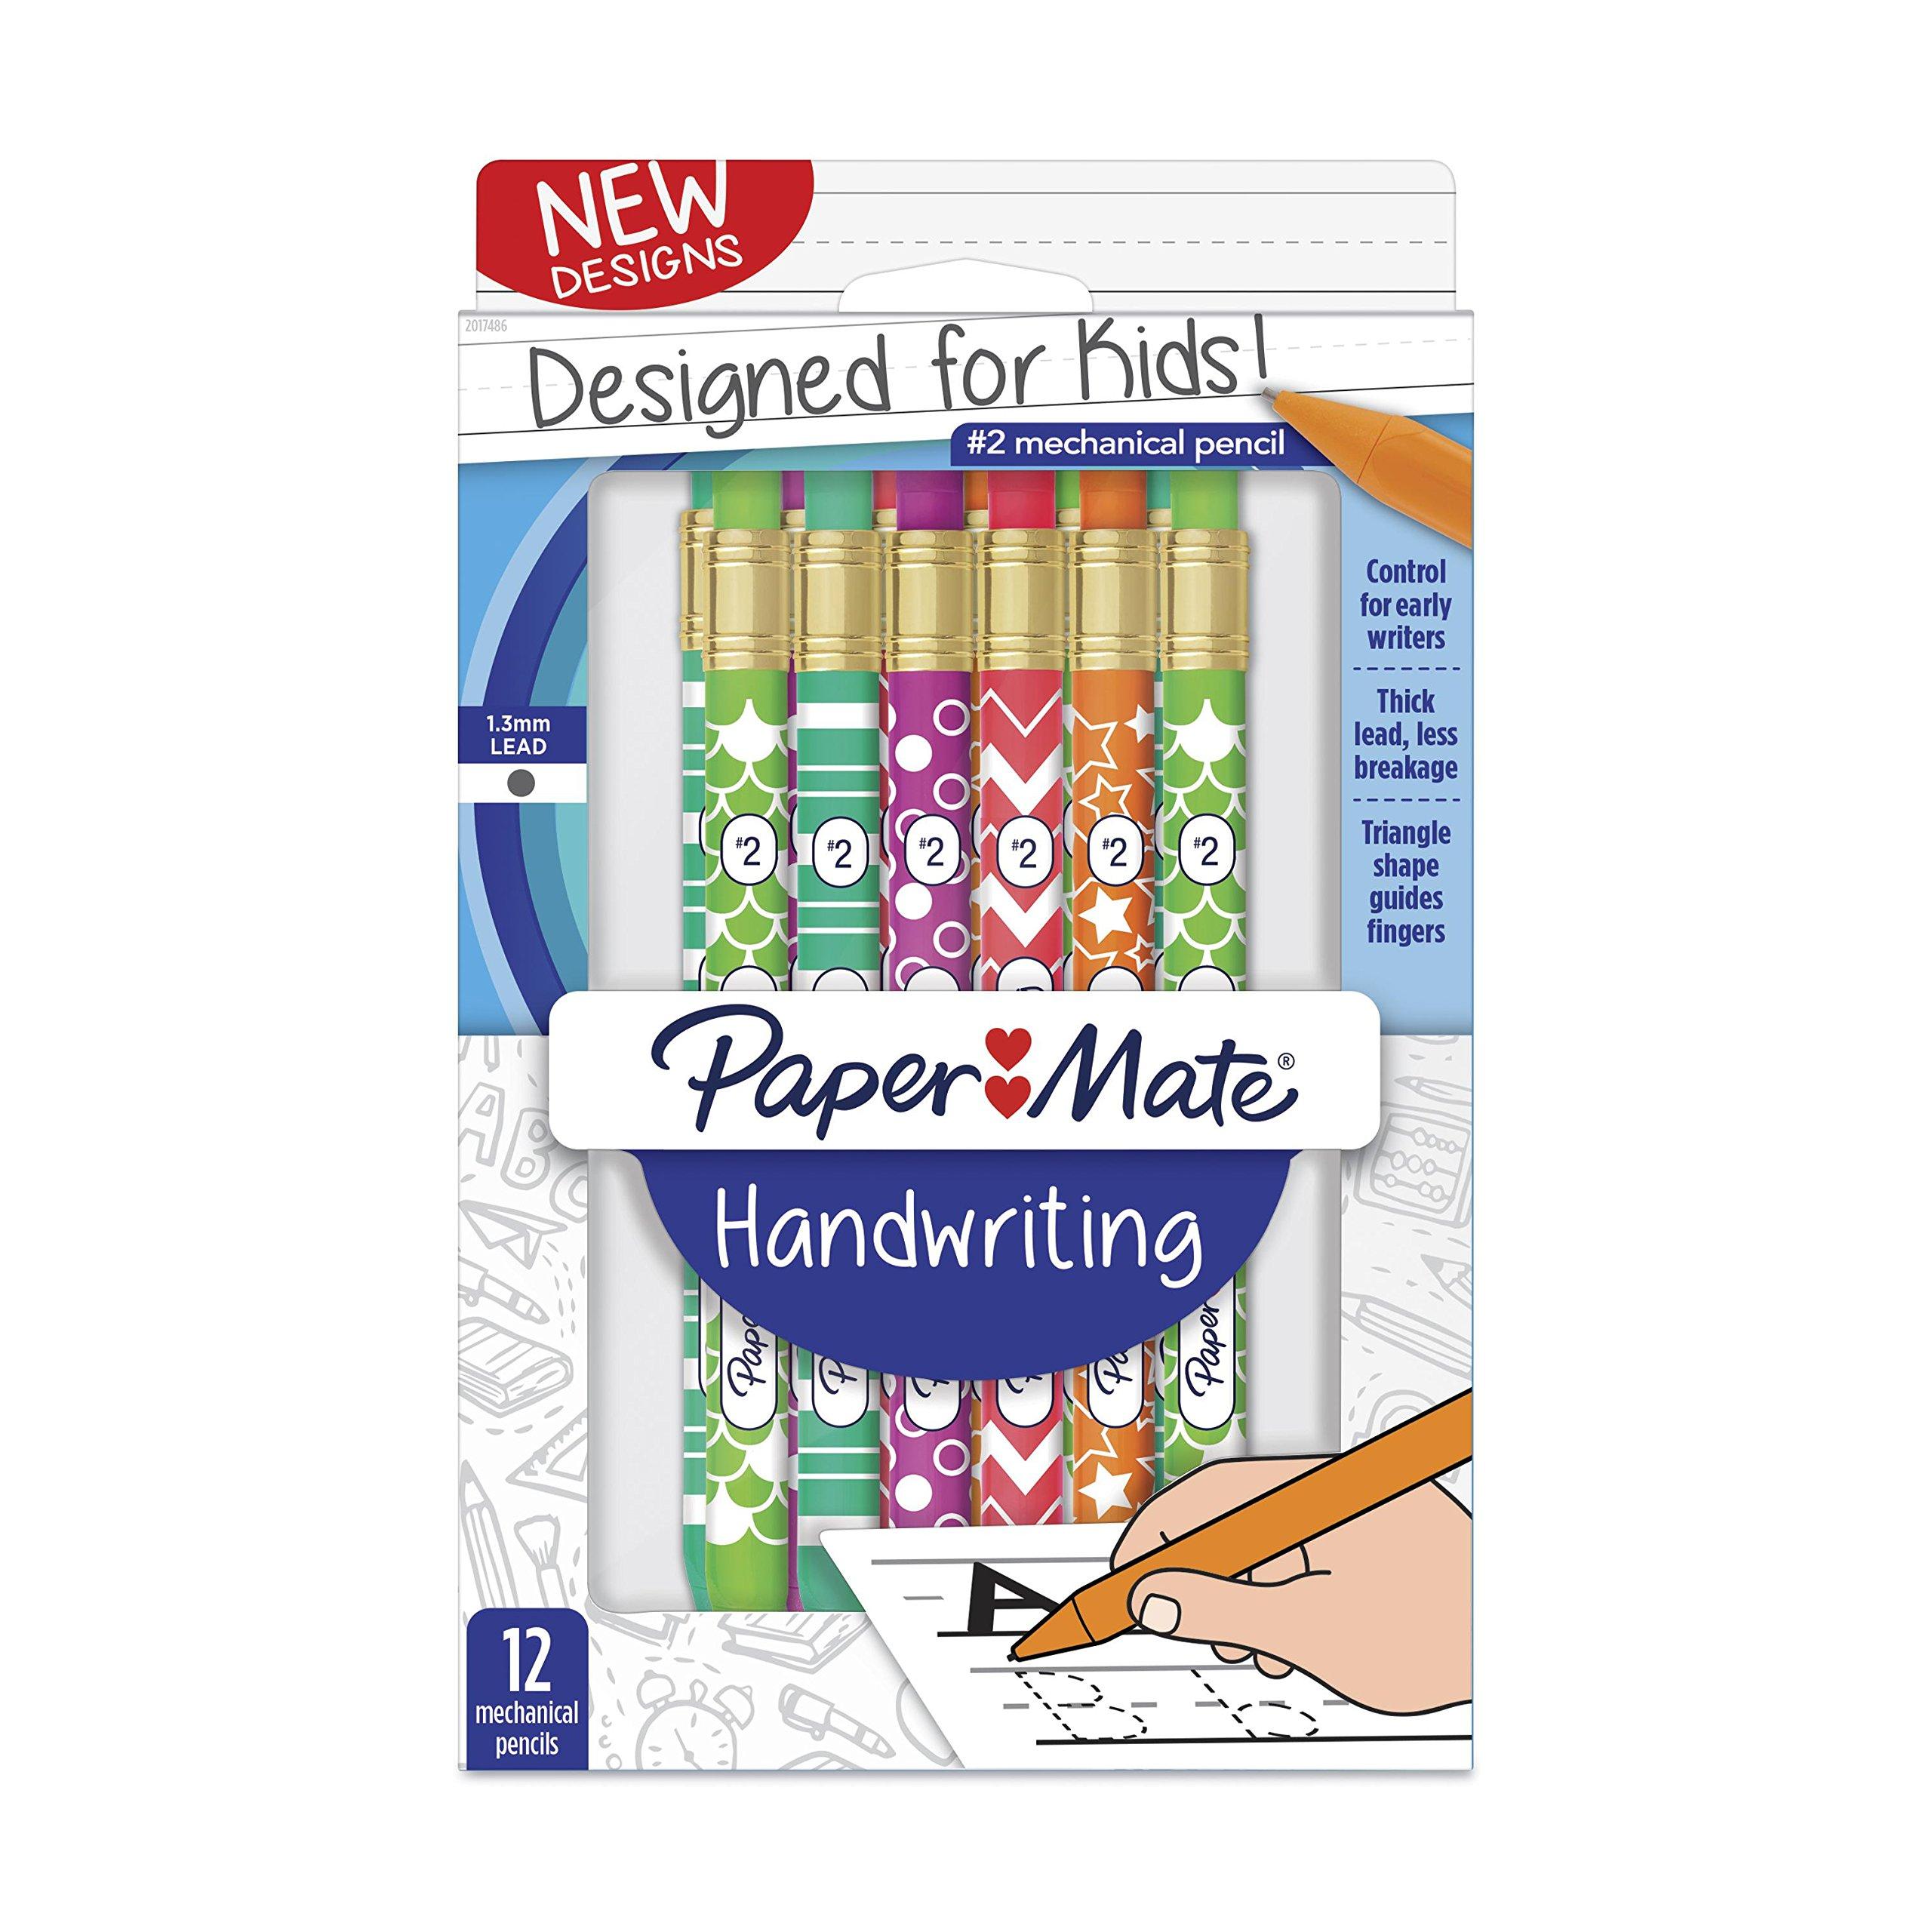 Paper Mate Handwriting Mechanical Pencils, Fashion Wraps, 12 Count (2017486)